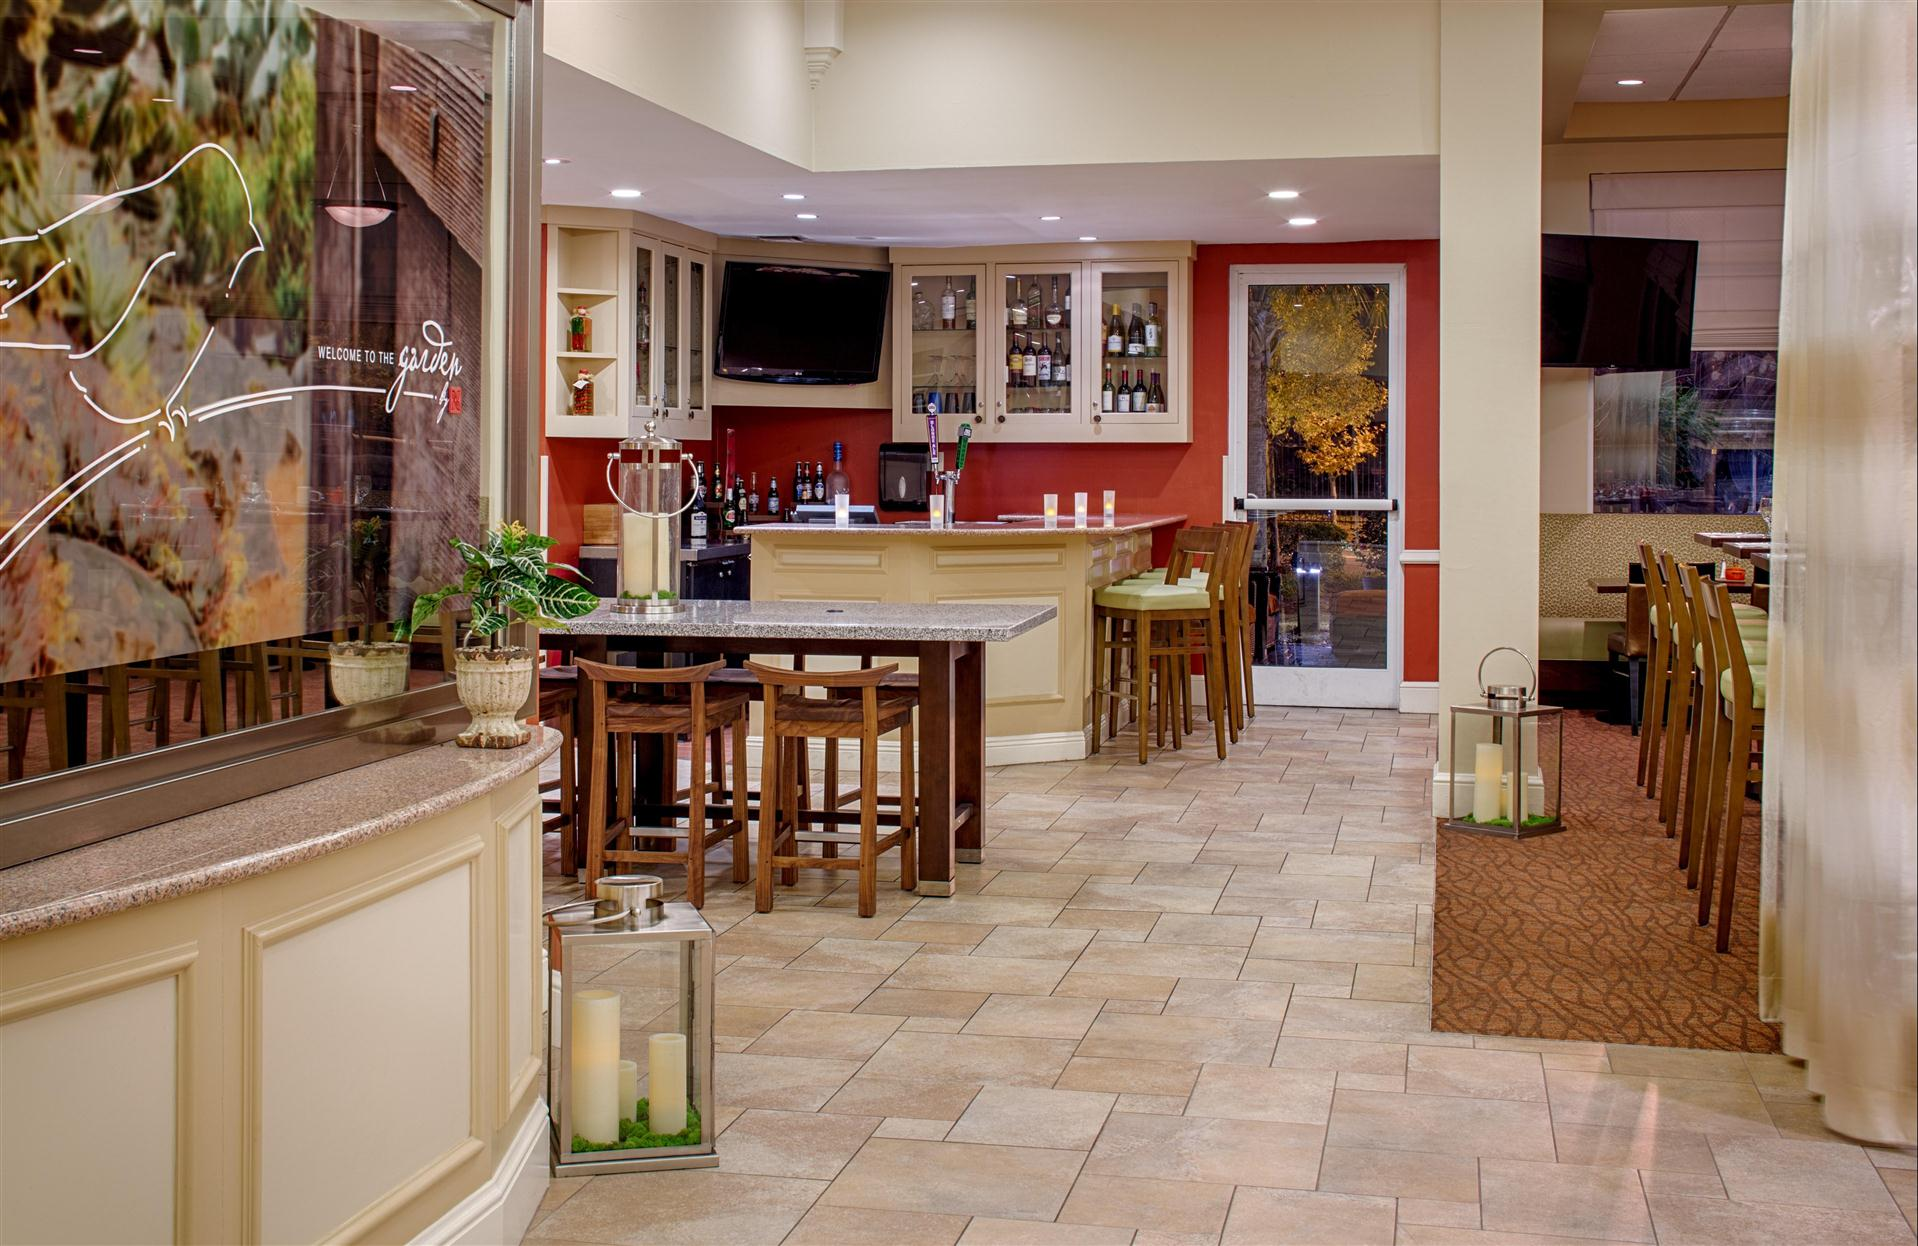 Meetings and Events at Hilton Garden Inn Baton Rouge Airport, Baton ...